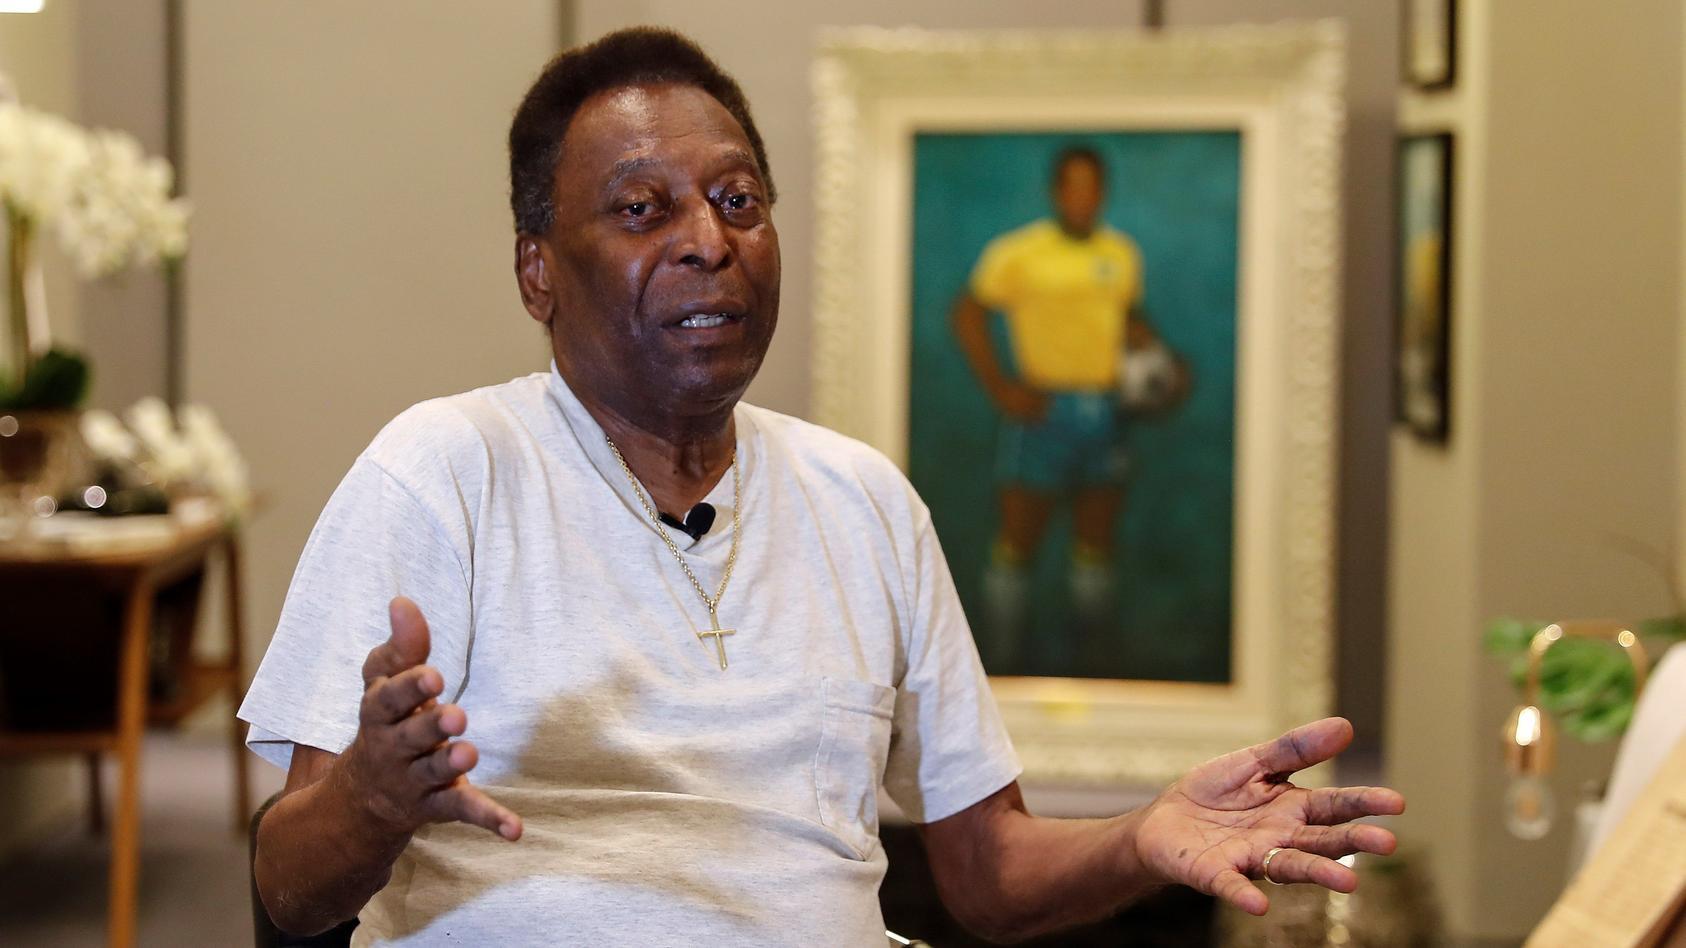 Brasiliens Fußball-Legende Pelé leidet an Depressionen.